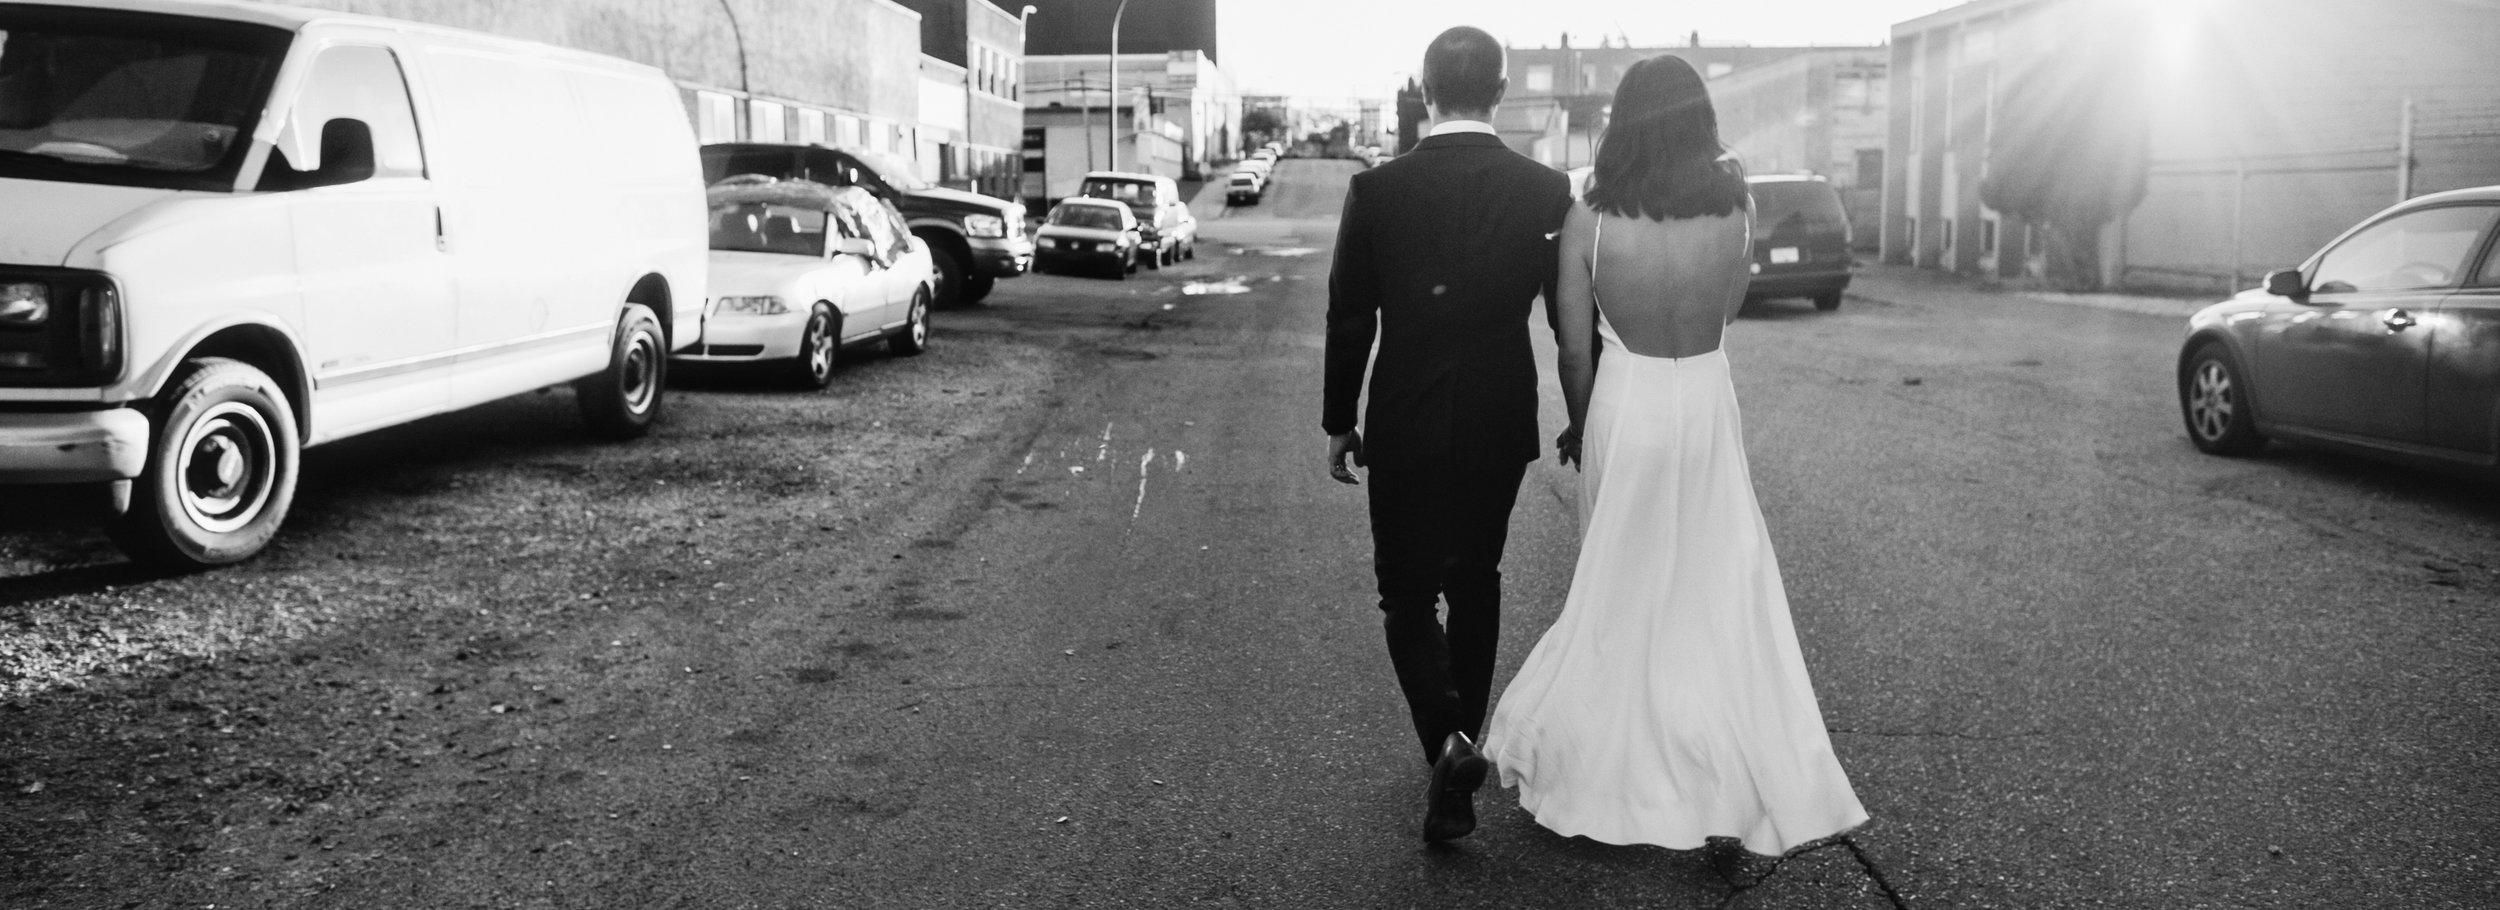 Bonaccord-Vancouver-Wedding-0092.JPG